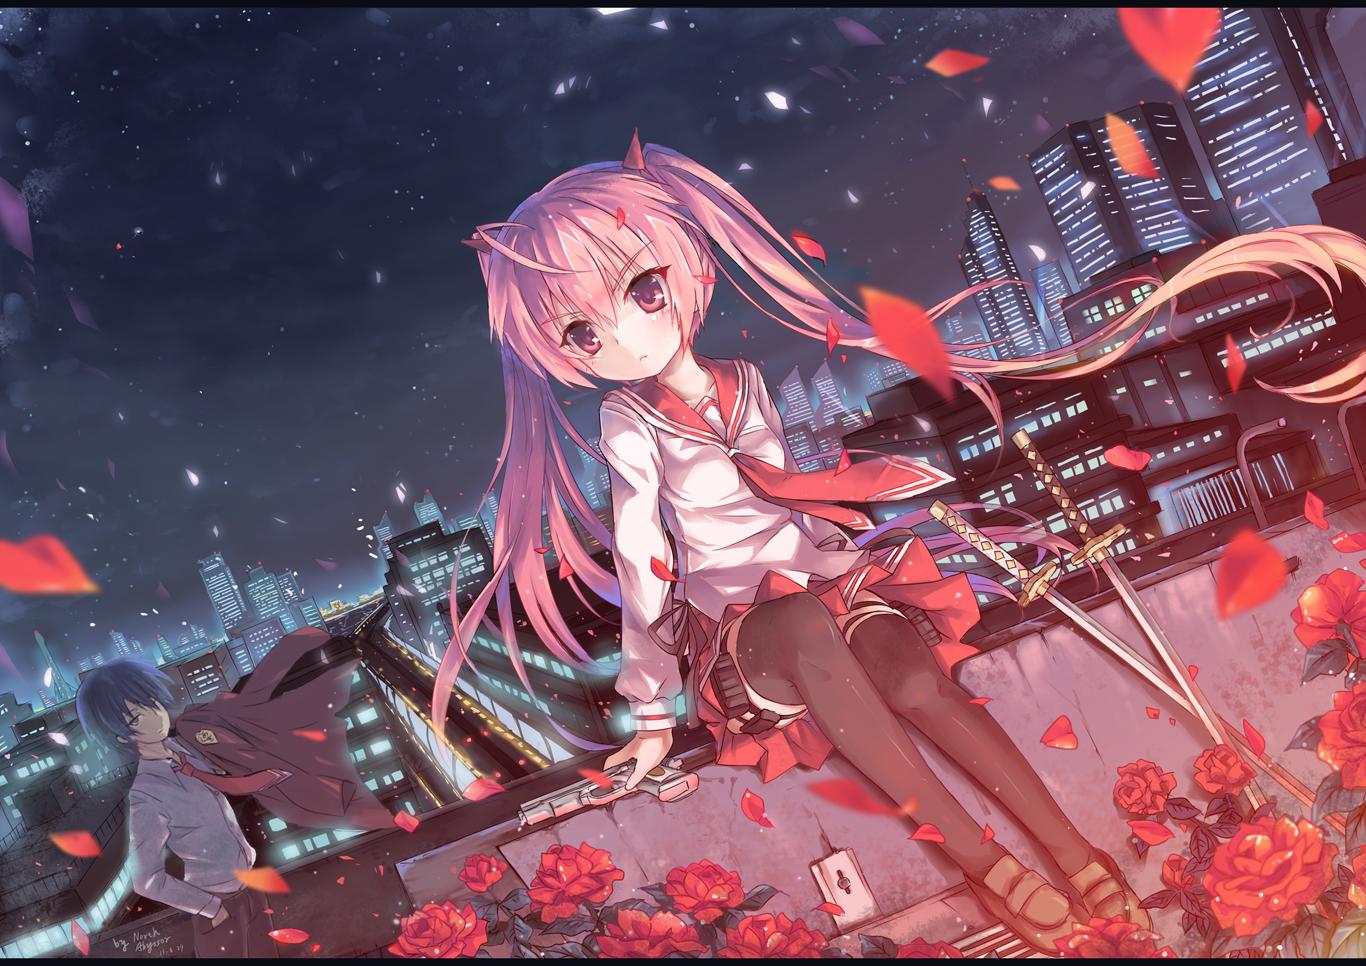 Hidan No Aria Aria The Scarlet Ammo Zerochan Anime Image Board